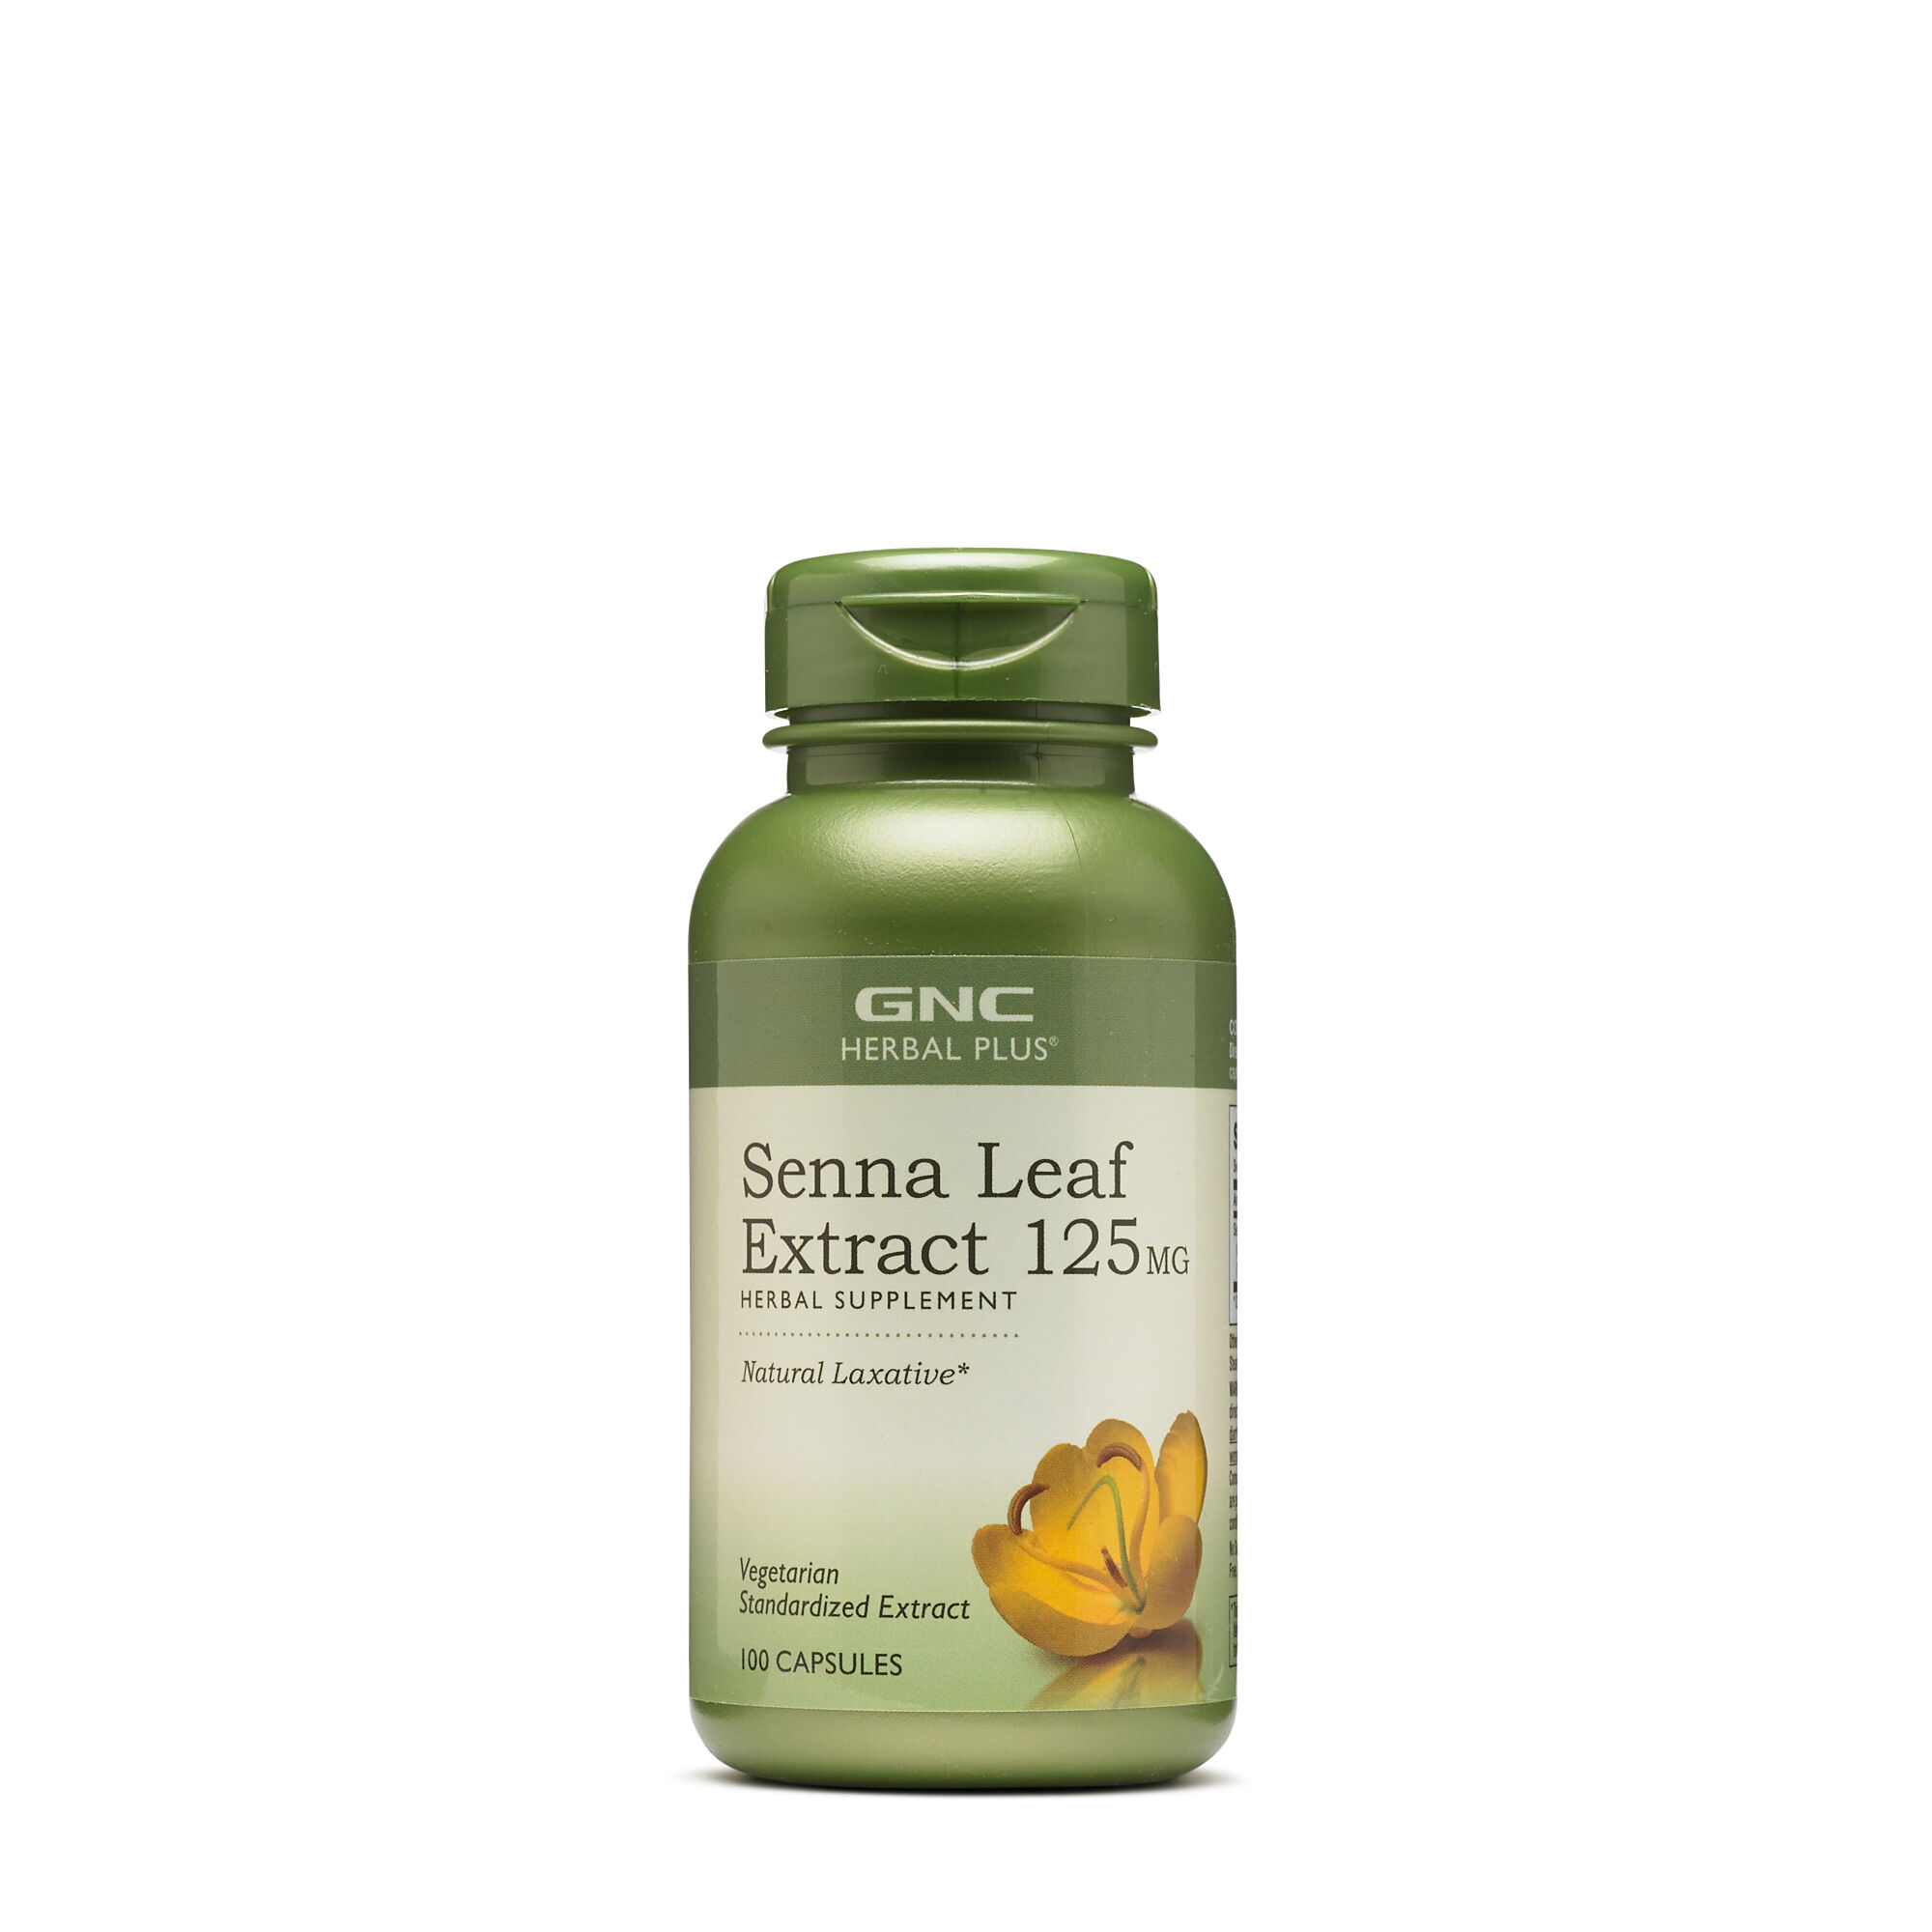 Gnc Herbal Plus Senna Leaf Extract 125mg